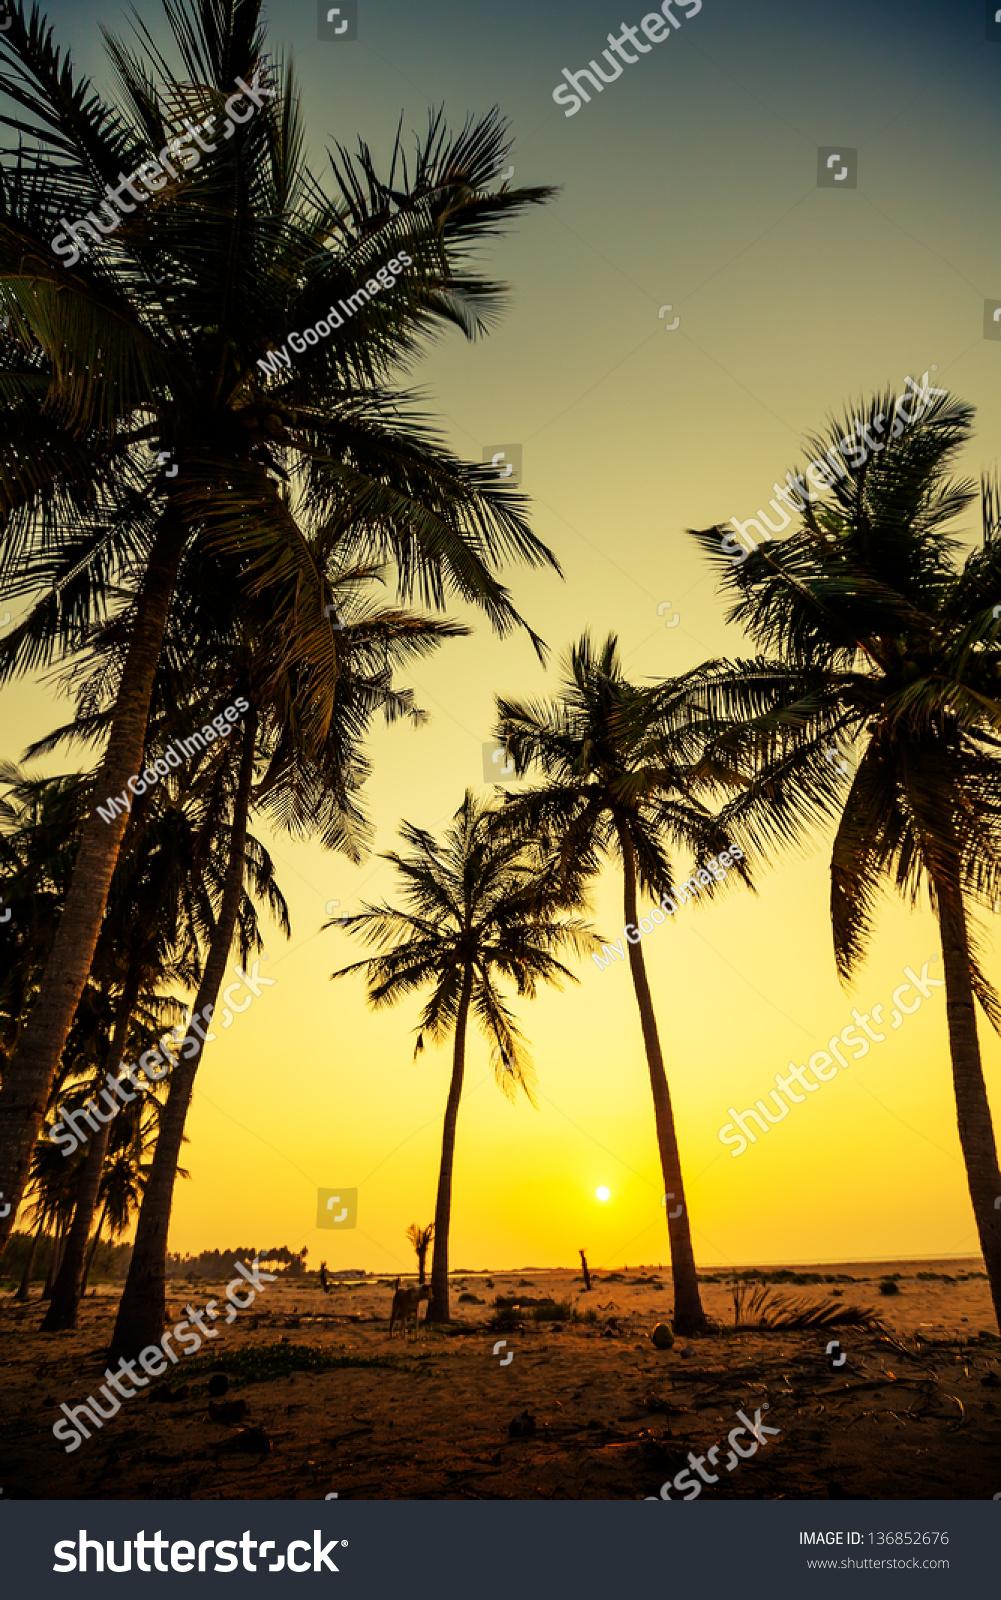 Silhouette Od Palm Trees Seashore Sri Stock Edit Now